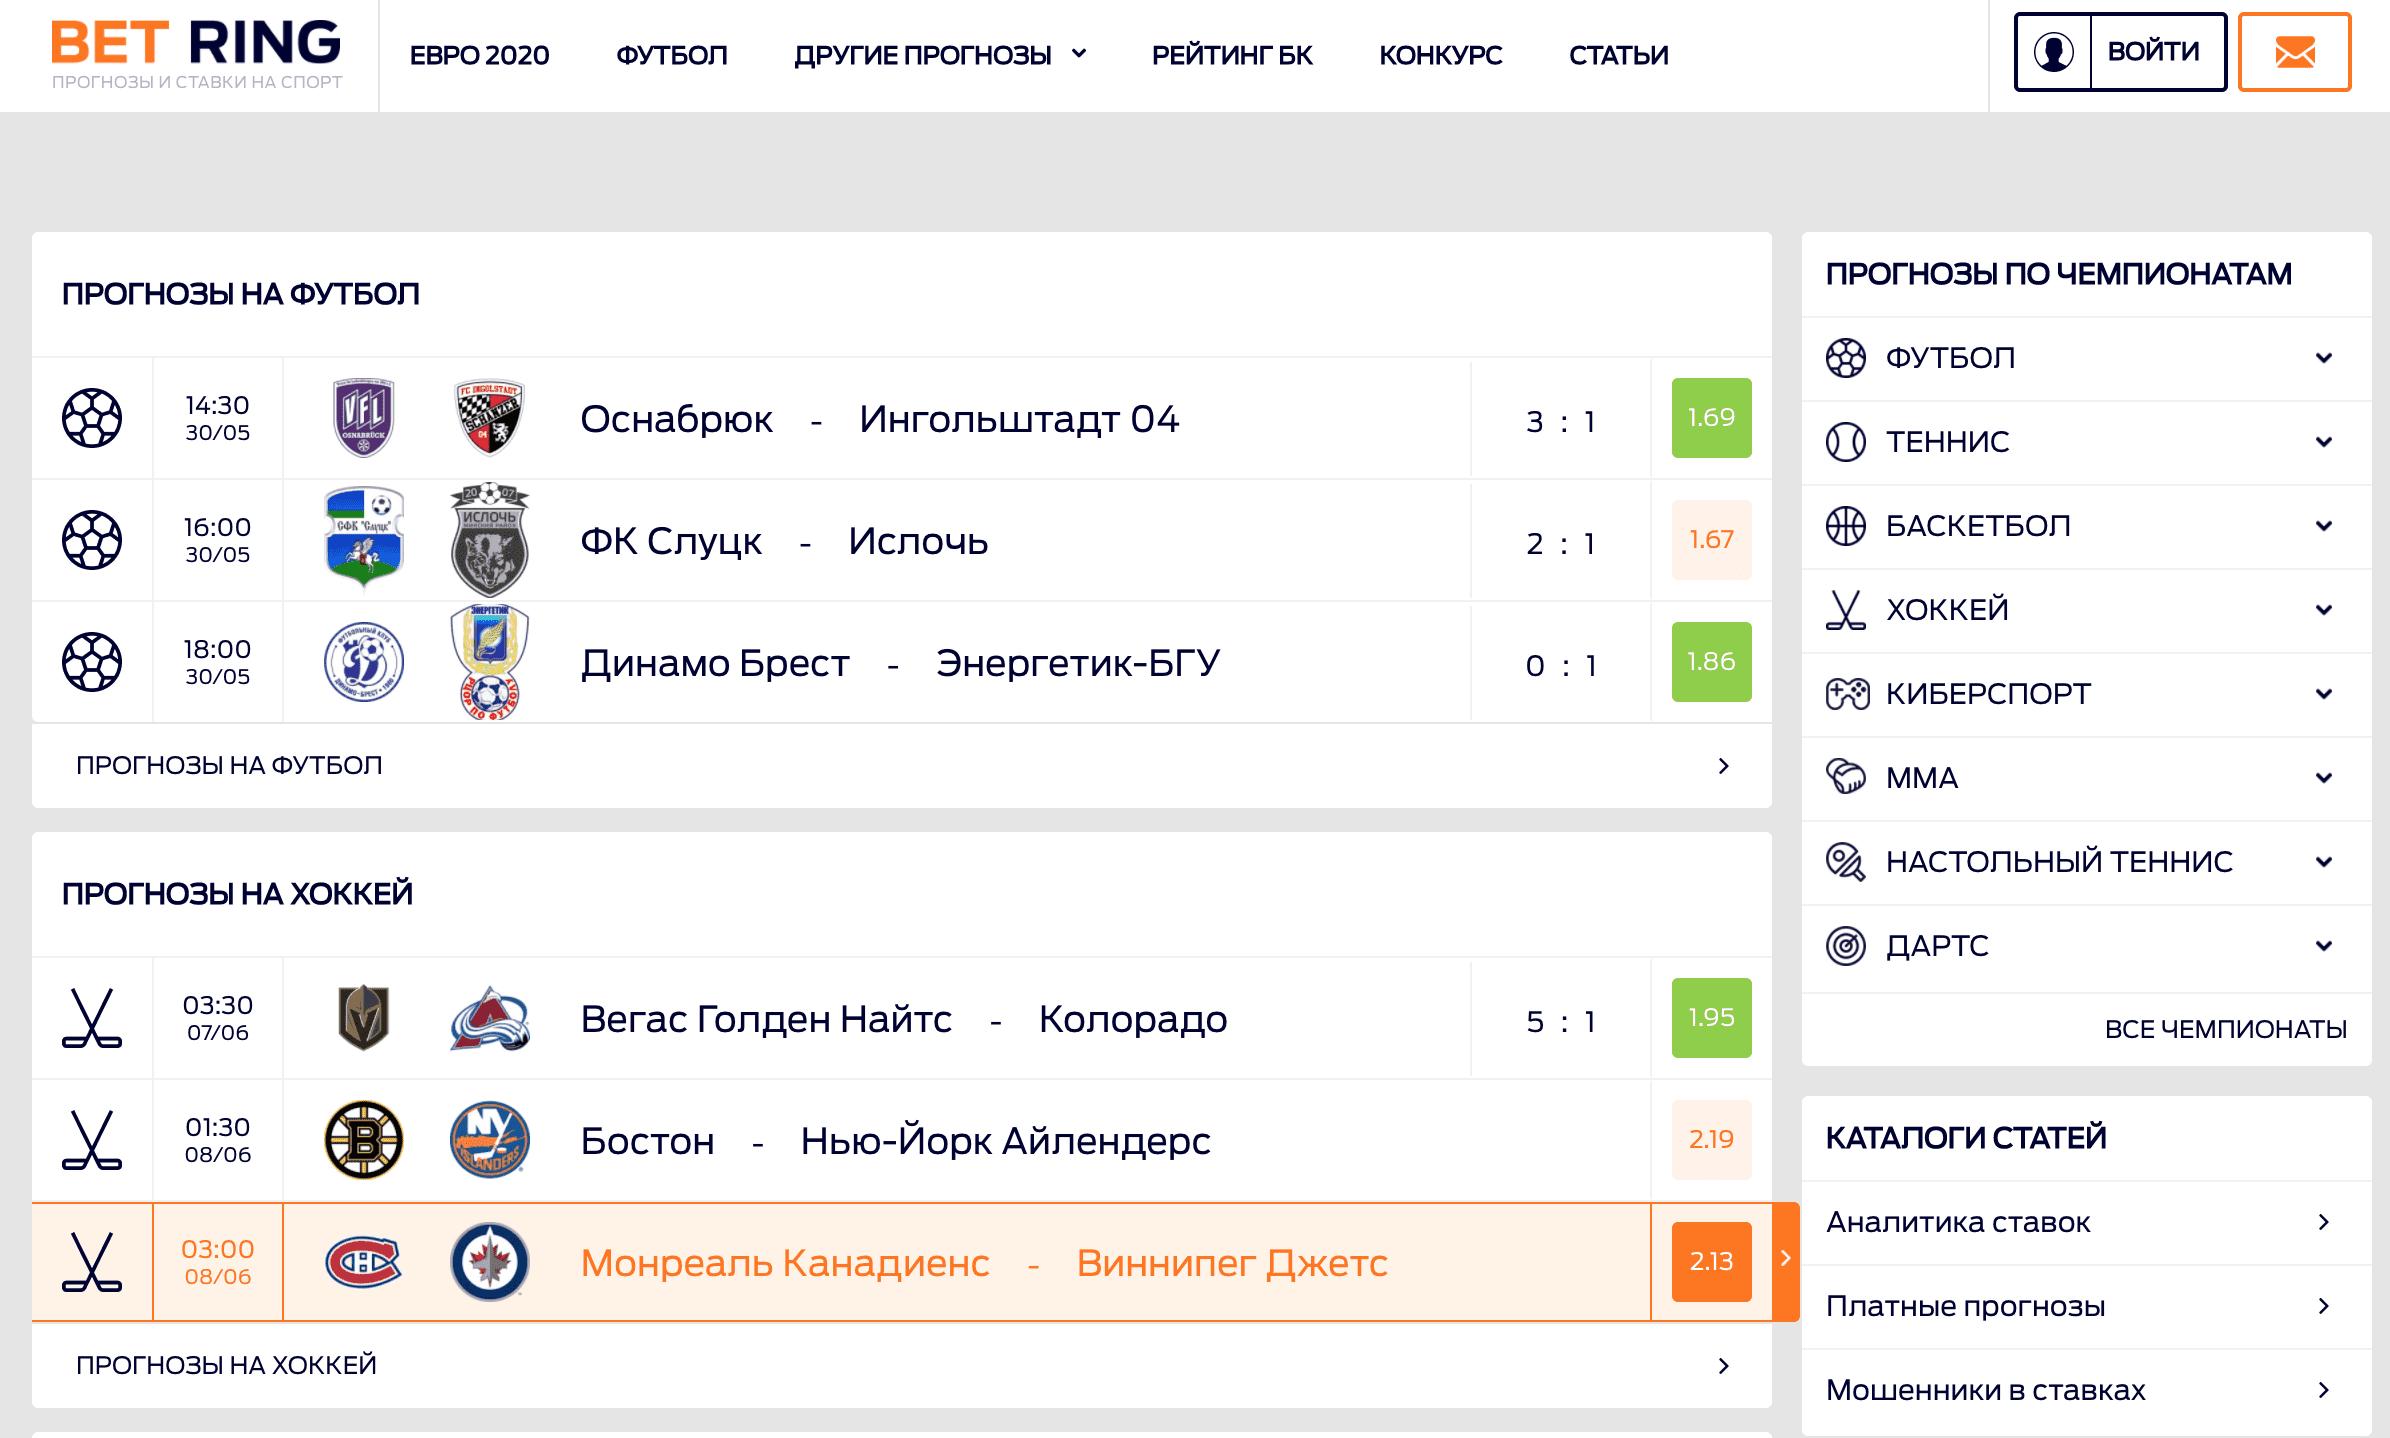 Главная страница сайта Bet-ring.ru(Бет Ринг)